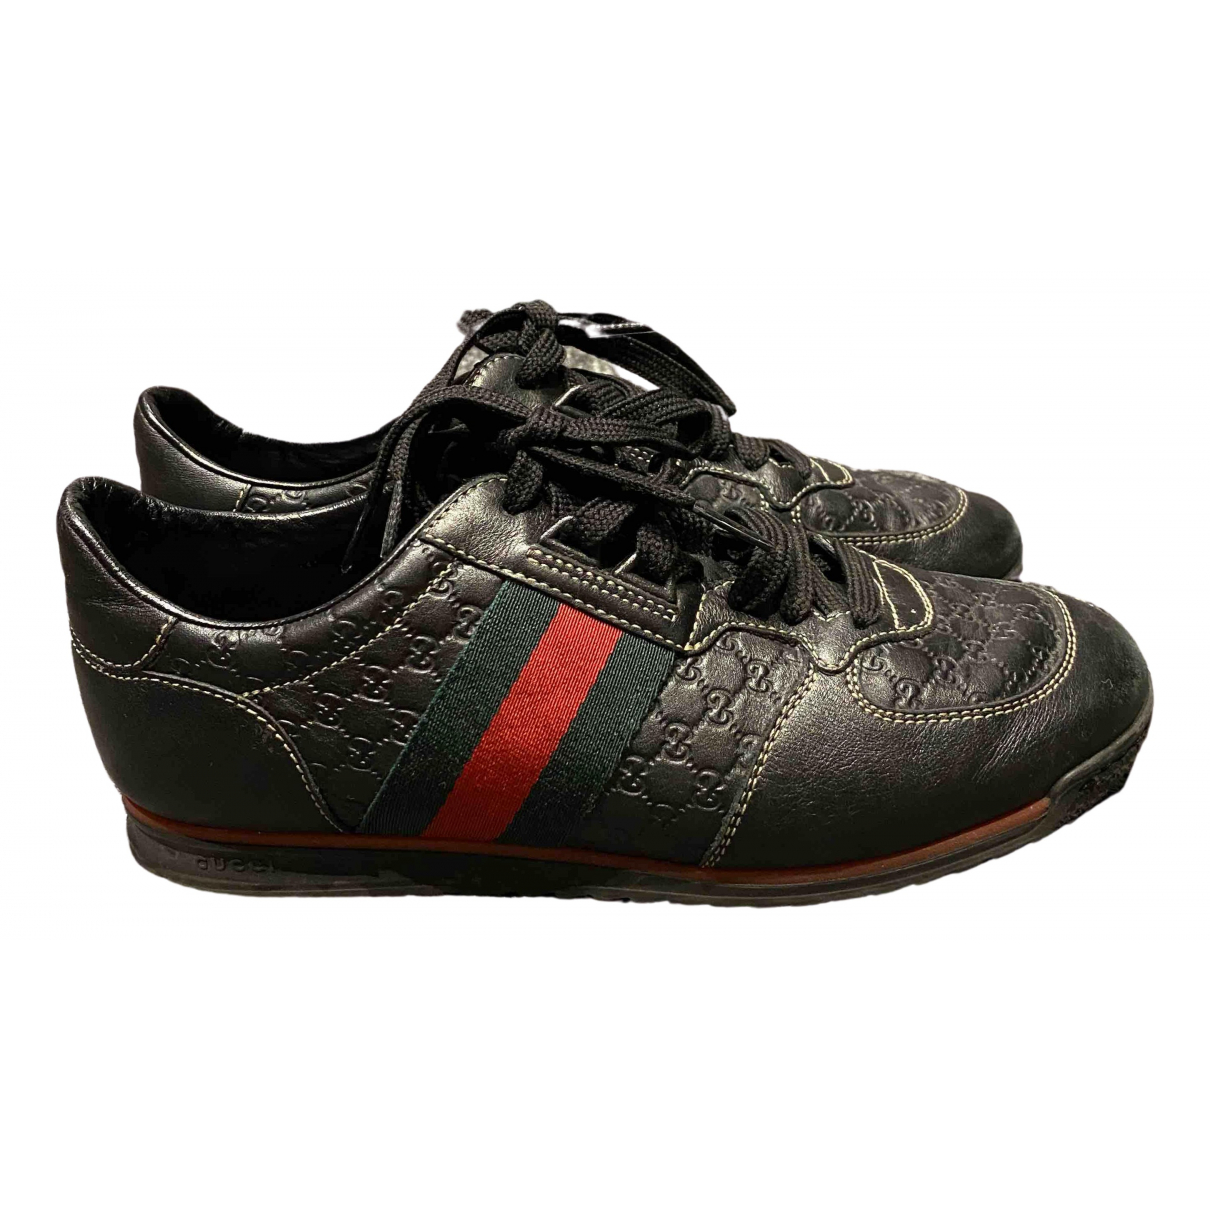 Gucci Gucci Dapper Dan Black Leather Trainers for Men 5 UK